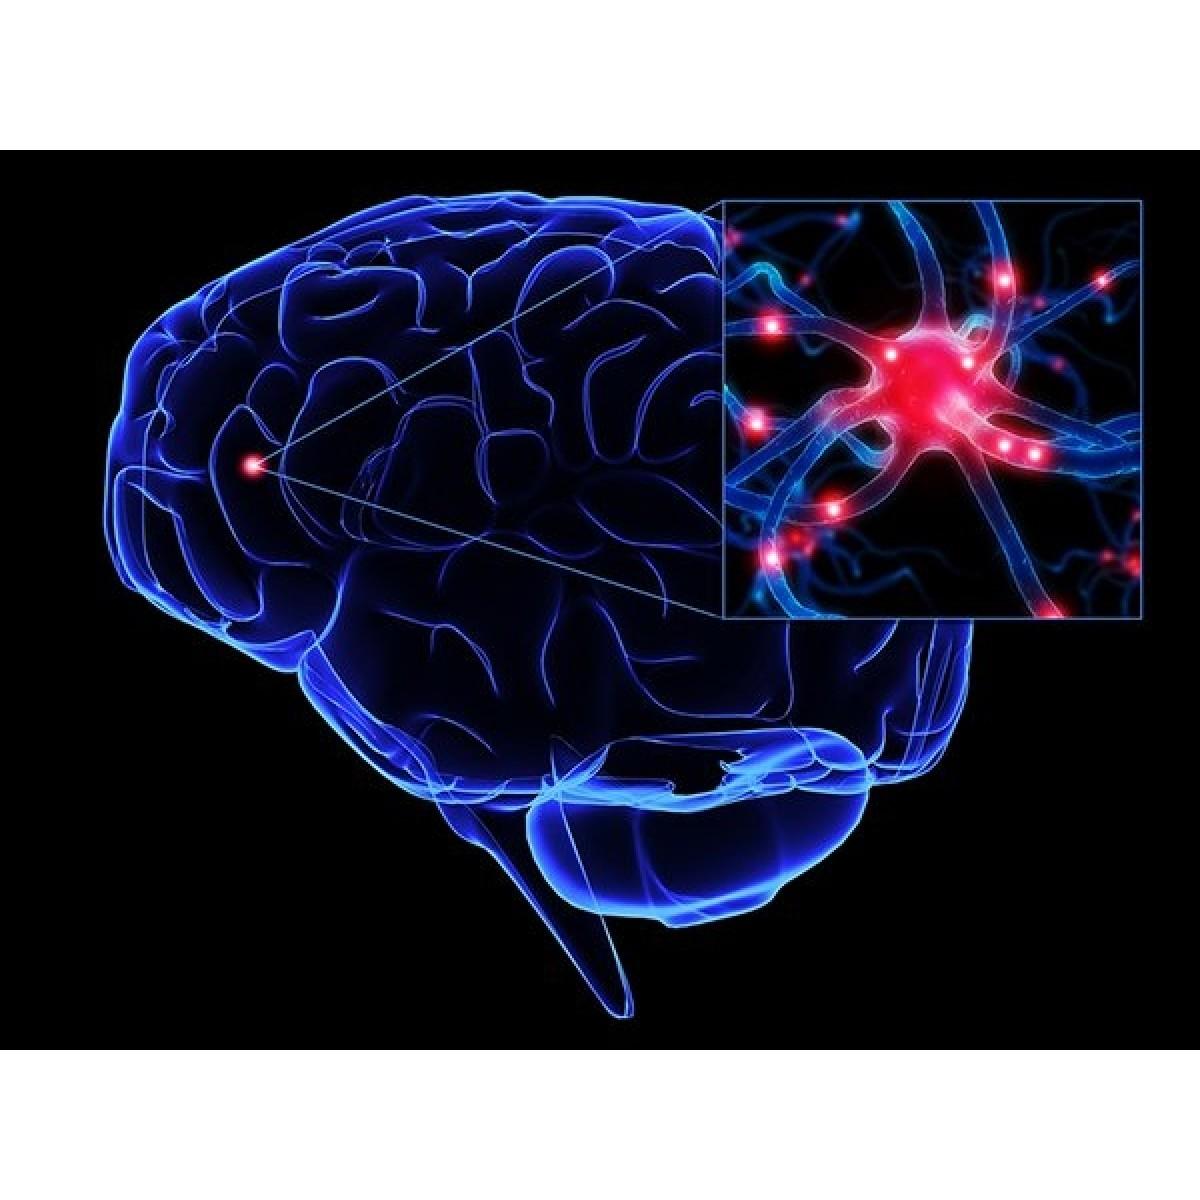 Vielight 810 Infrared Brain Intranasal Light Therapy